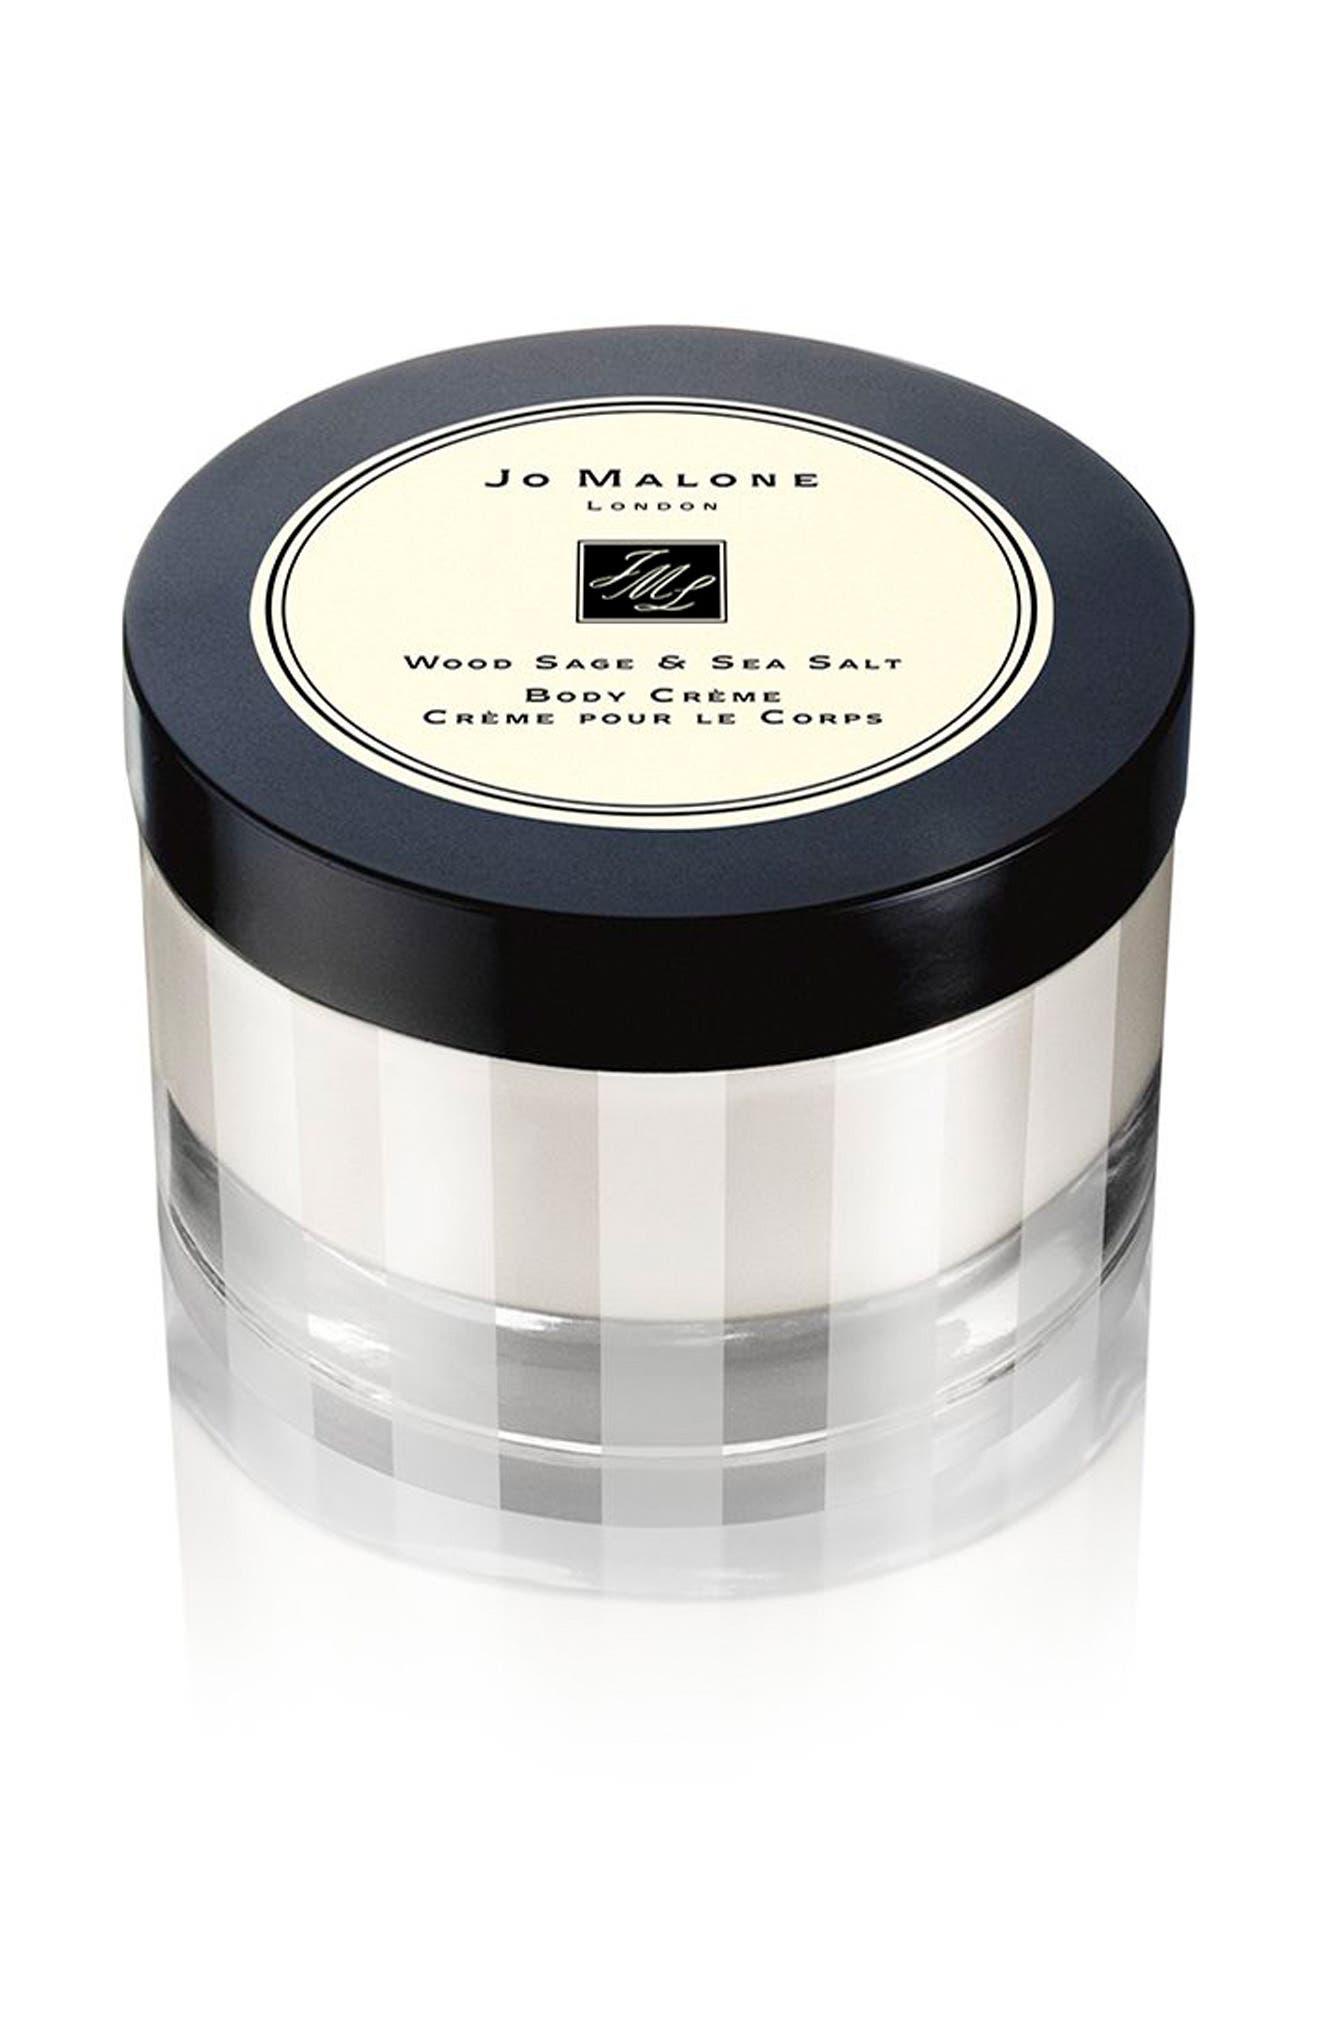 Jo Malone London™ Wood Sage & Sea Salt Body Cream